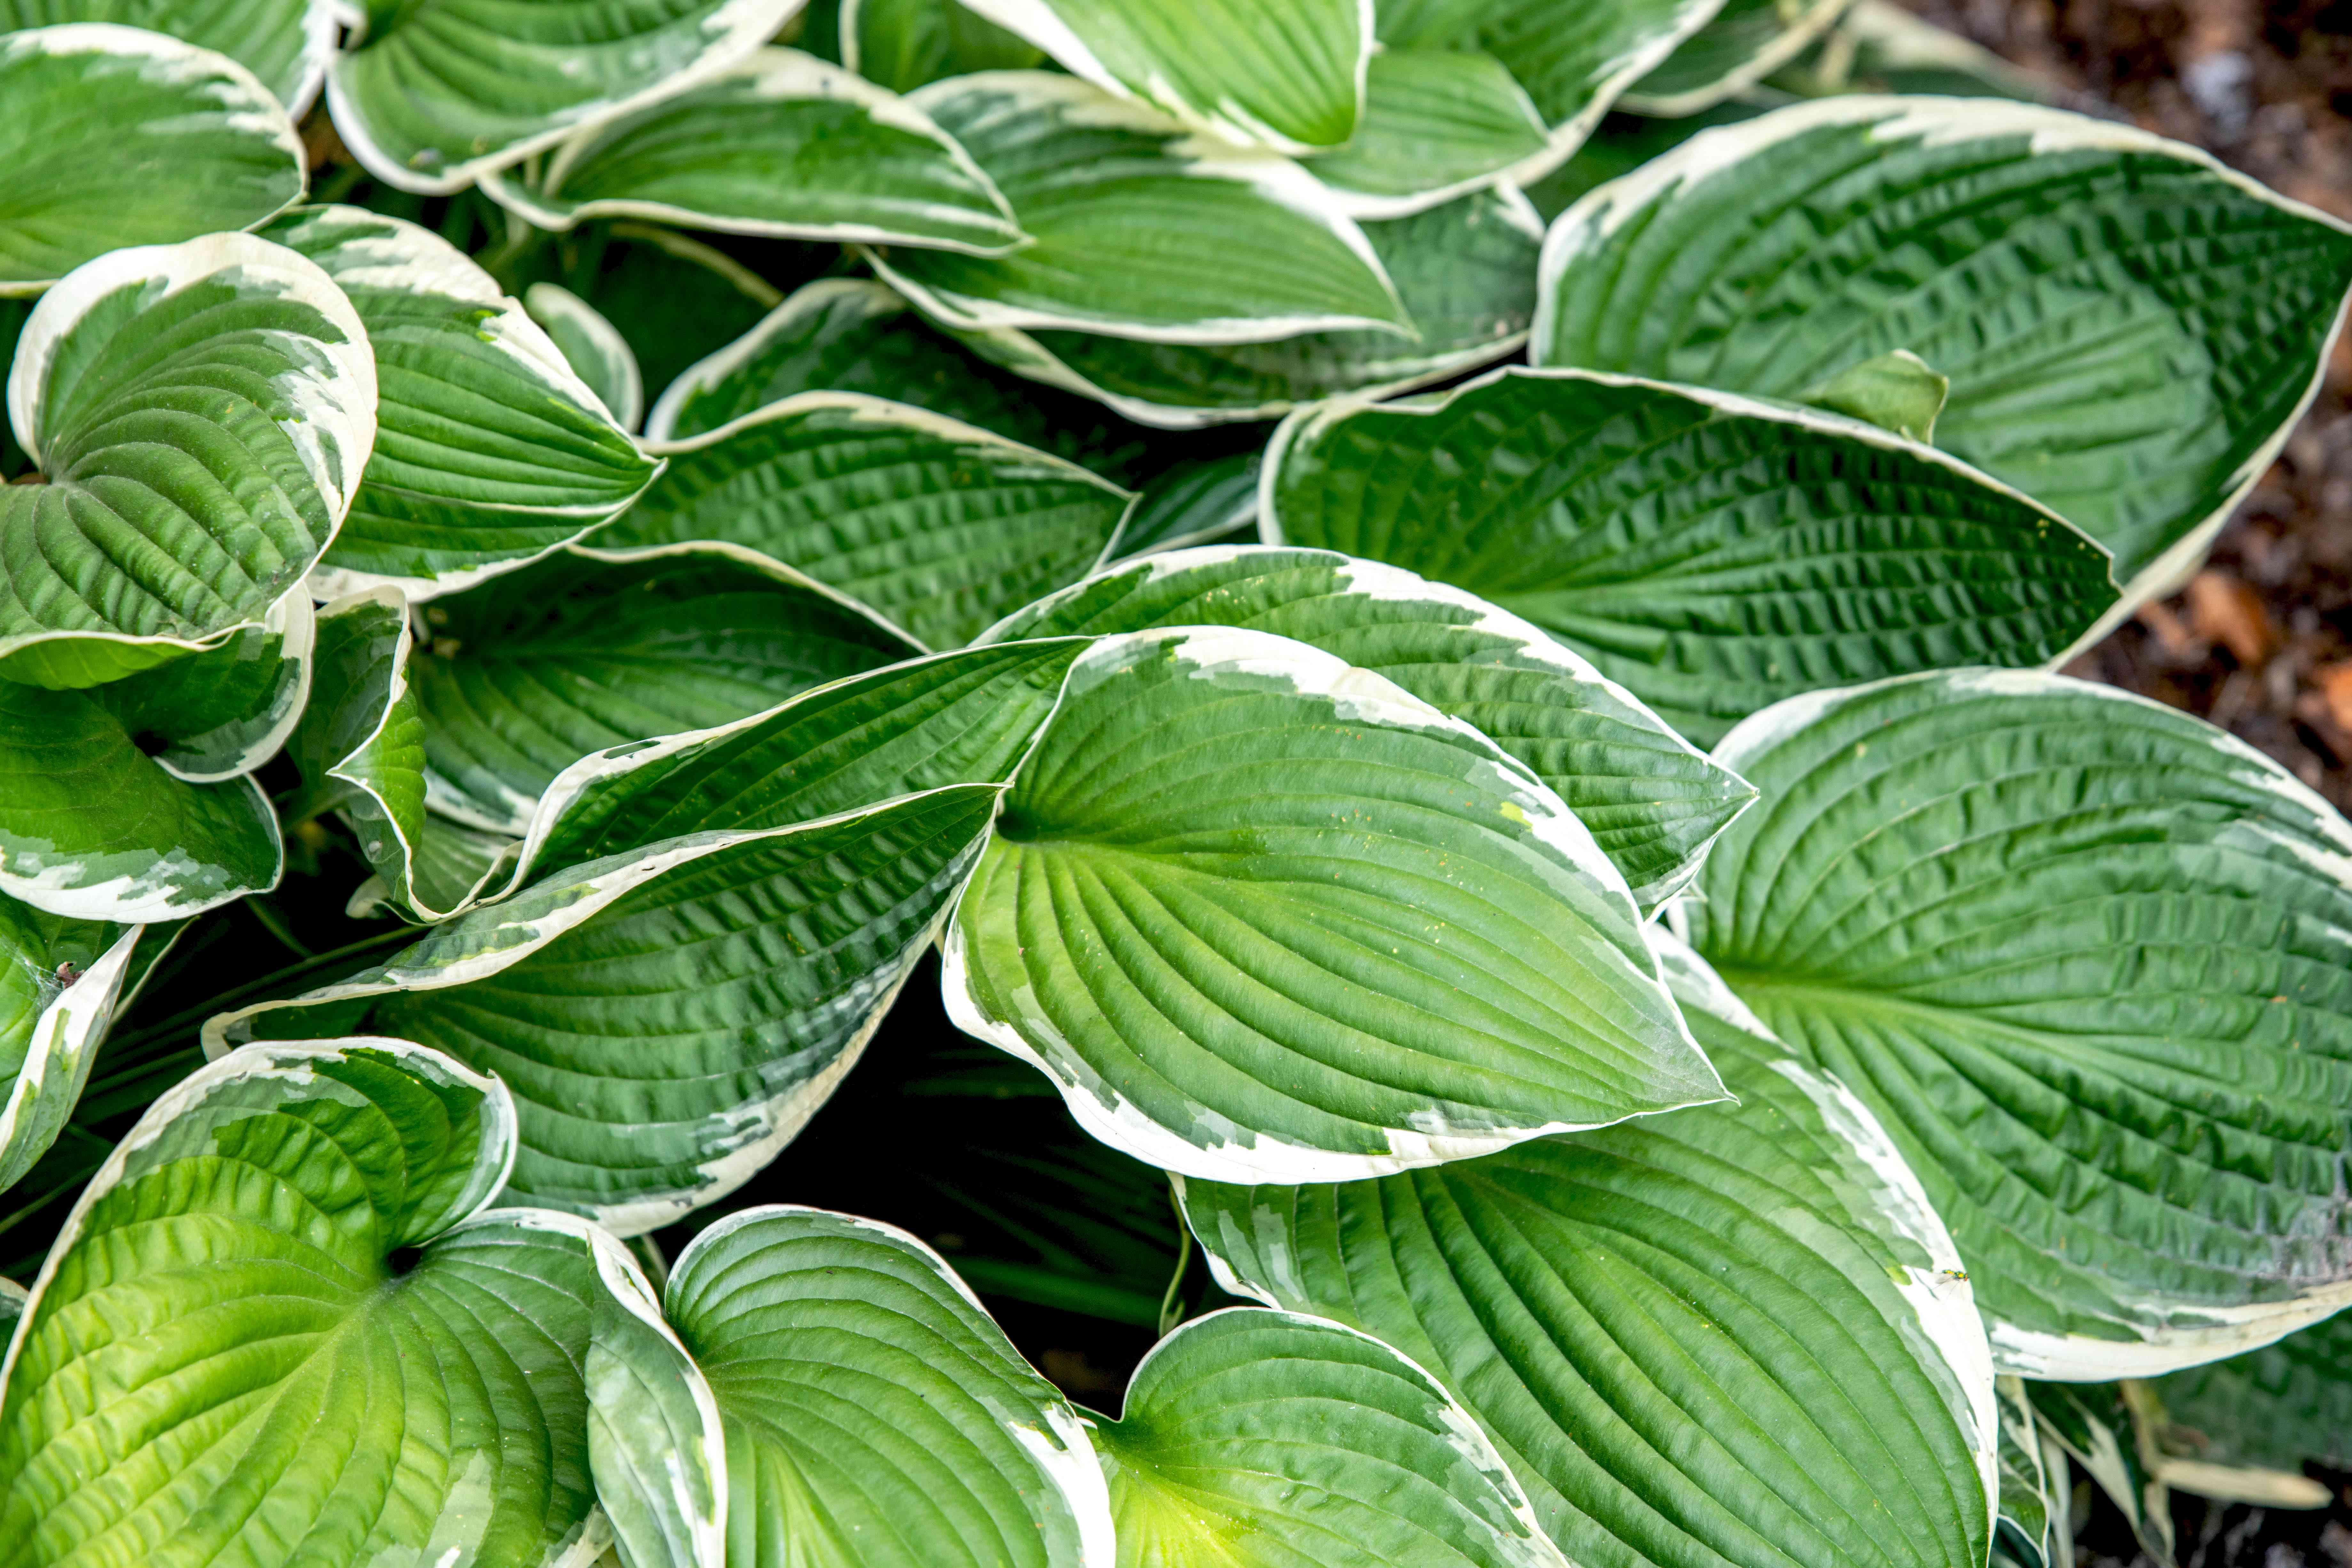 Francee hosta plant with large heart-shaped variegated leaves clustered together